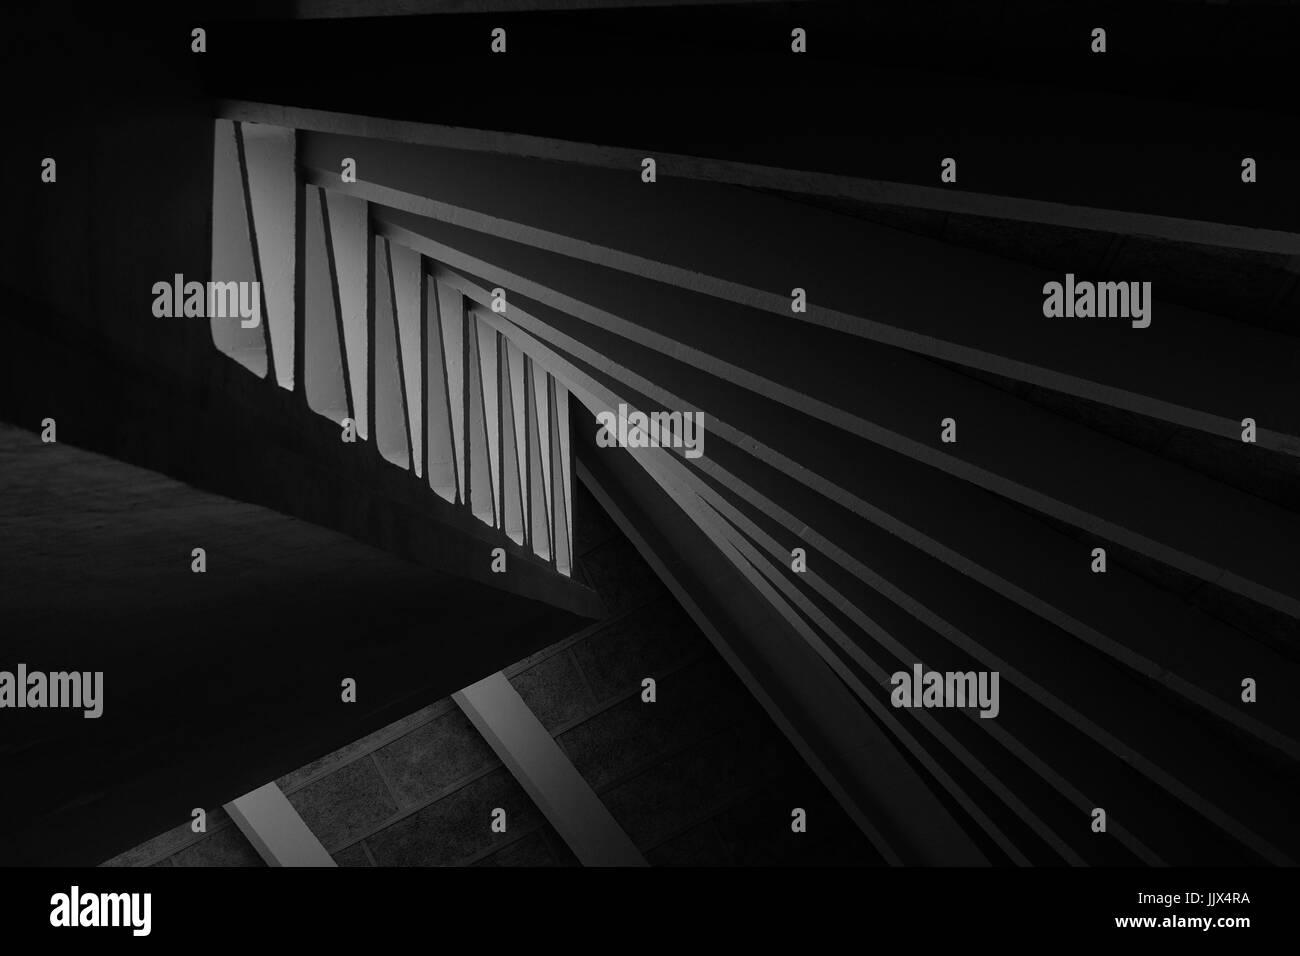 Shaft of lights enters building - Stock Image